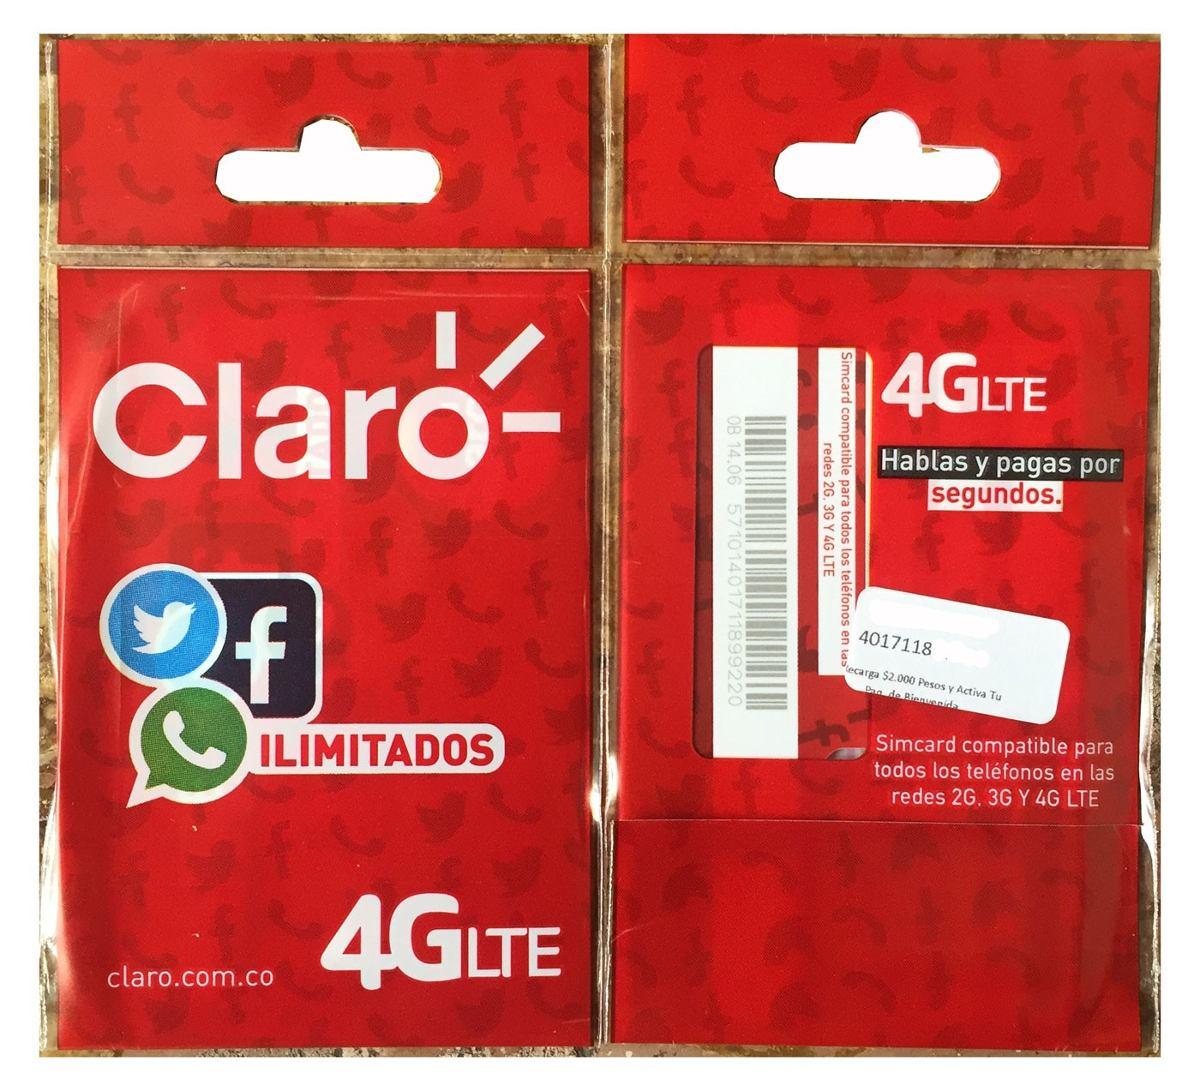 Superpromo Sim Card 4g Lte Facebook Whatsapp Ilimitado 6x4